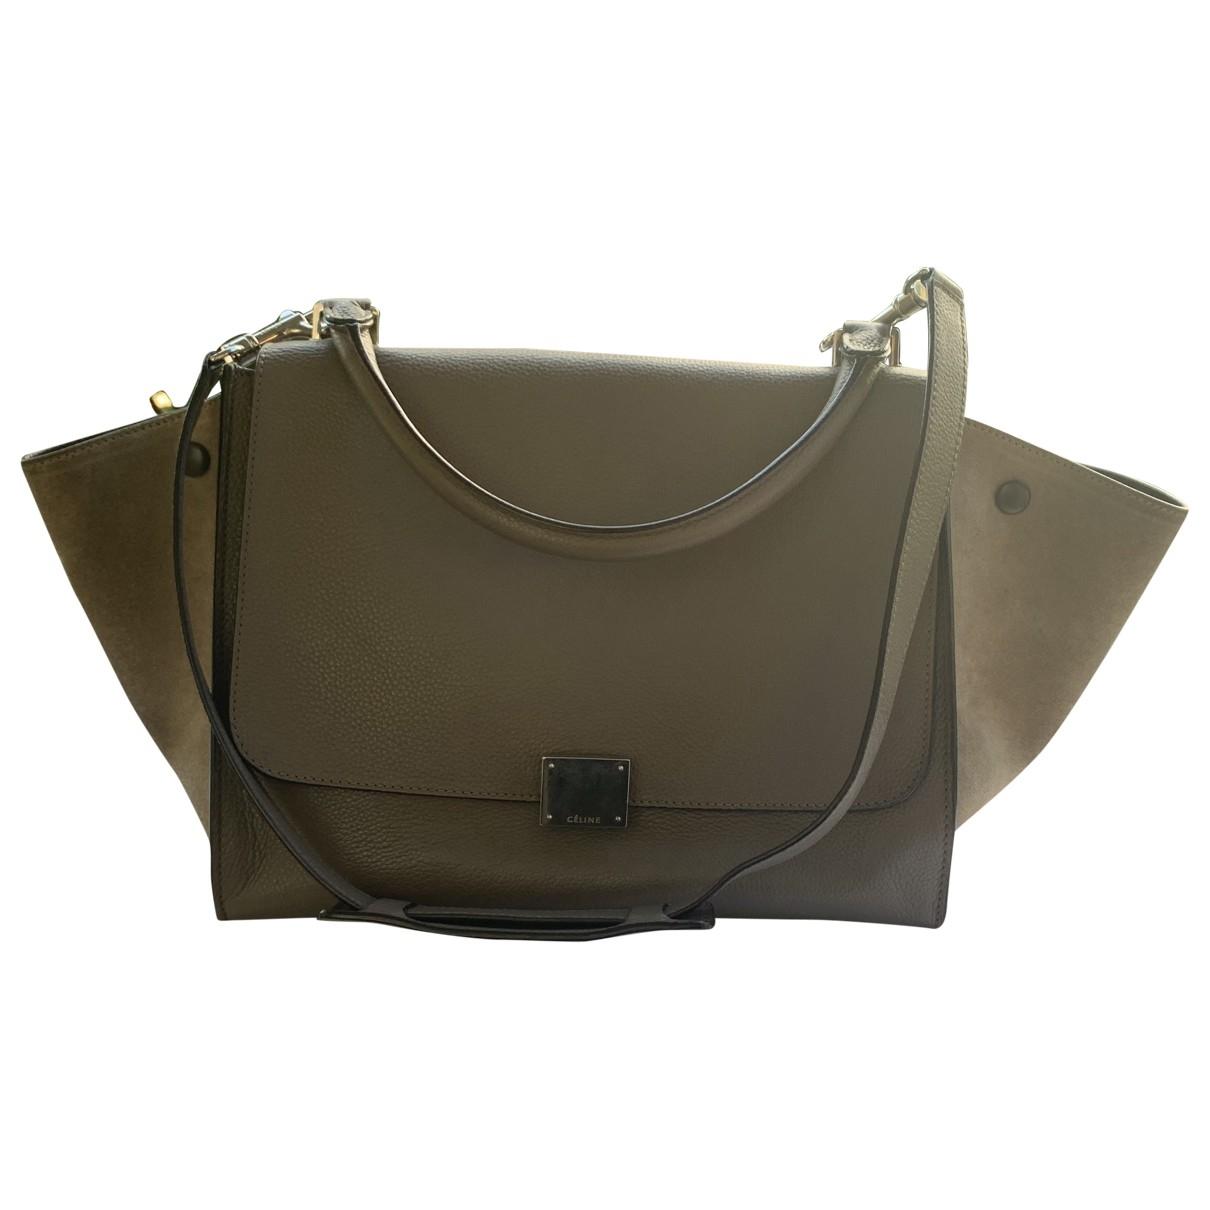 Celine Trapeze Handtasche in  Beige Leder